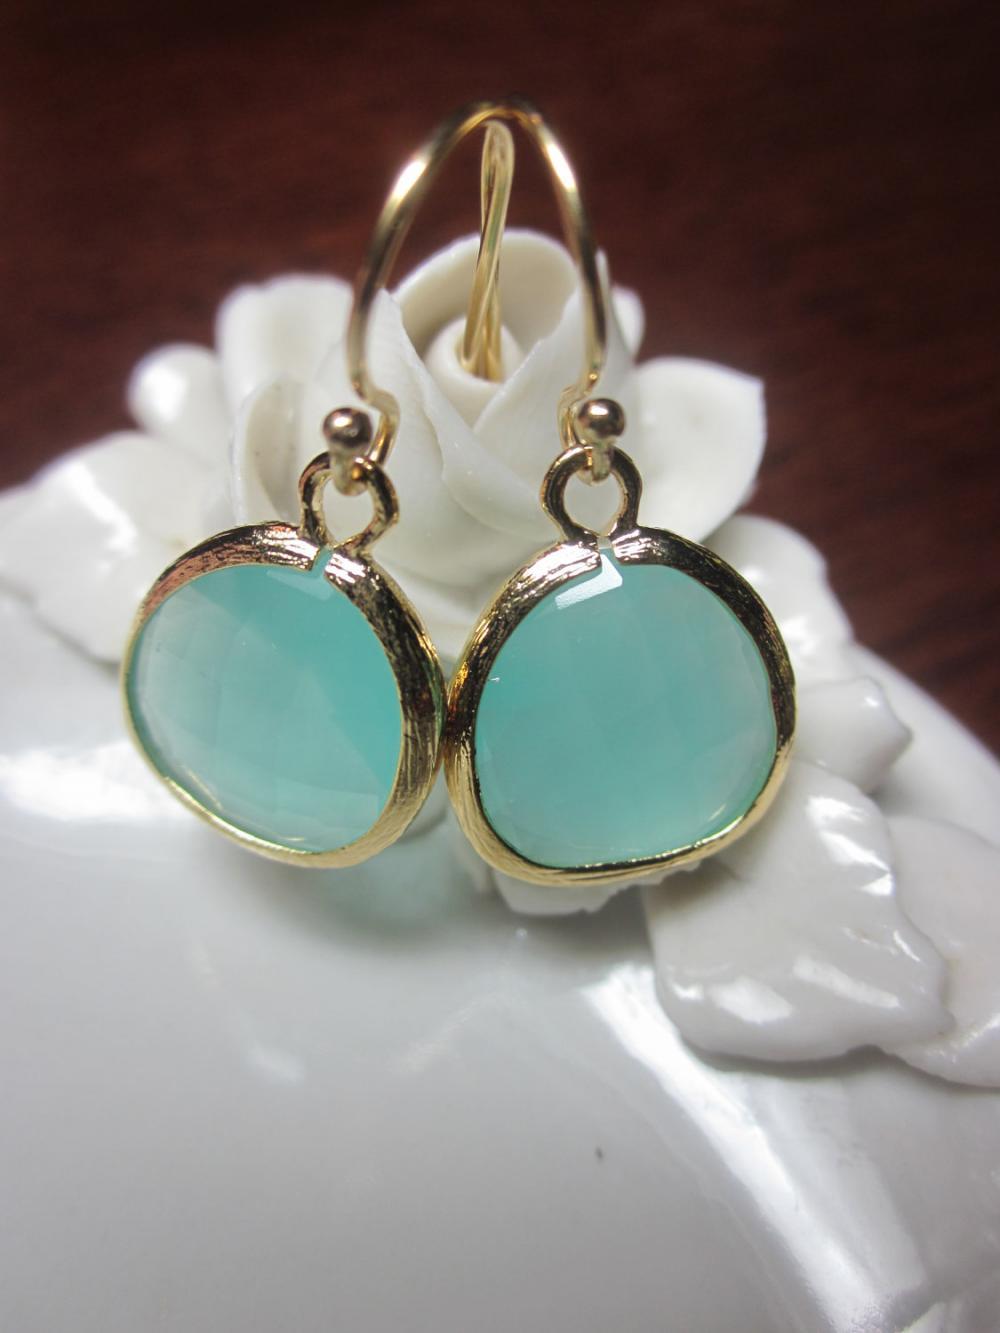 Pacific Aqua Earrings Blue - Bridesmaid Earrings Wedding Earrings